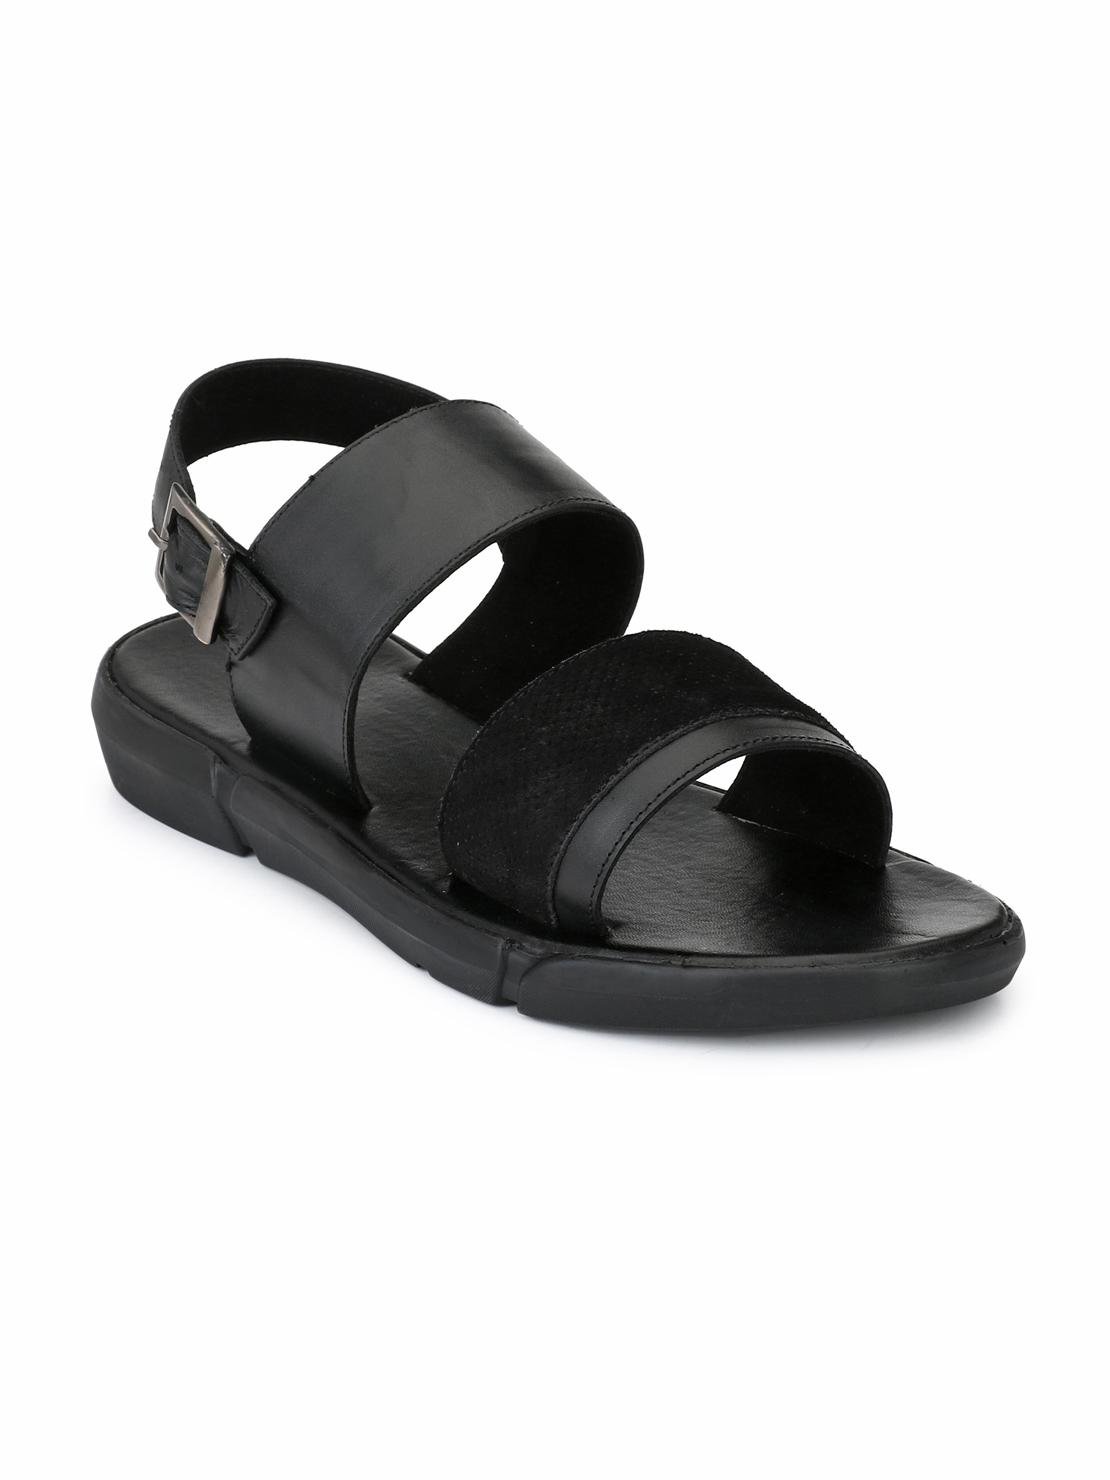 Guava | Guava Men's  Anti-Sweat Leather Black Sandals